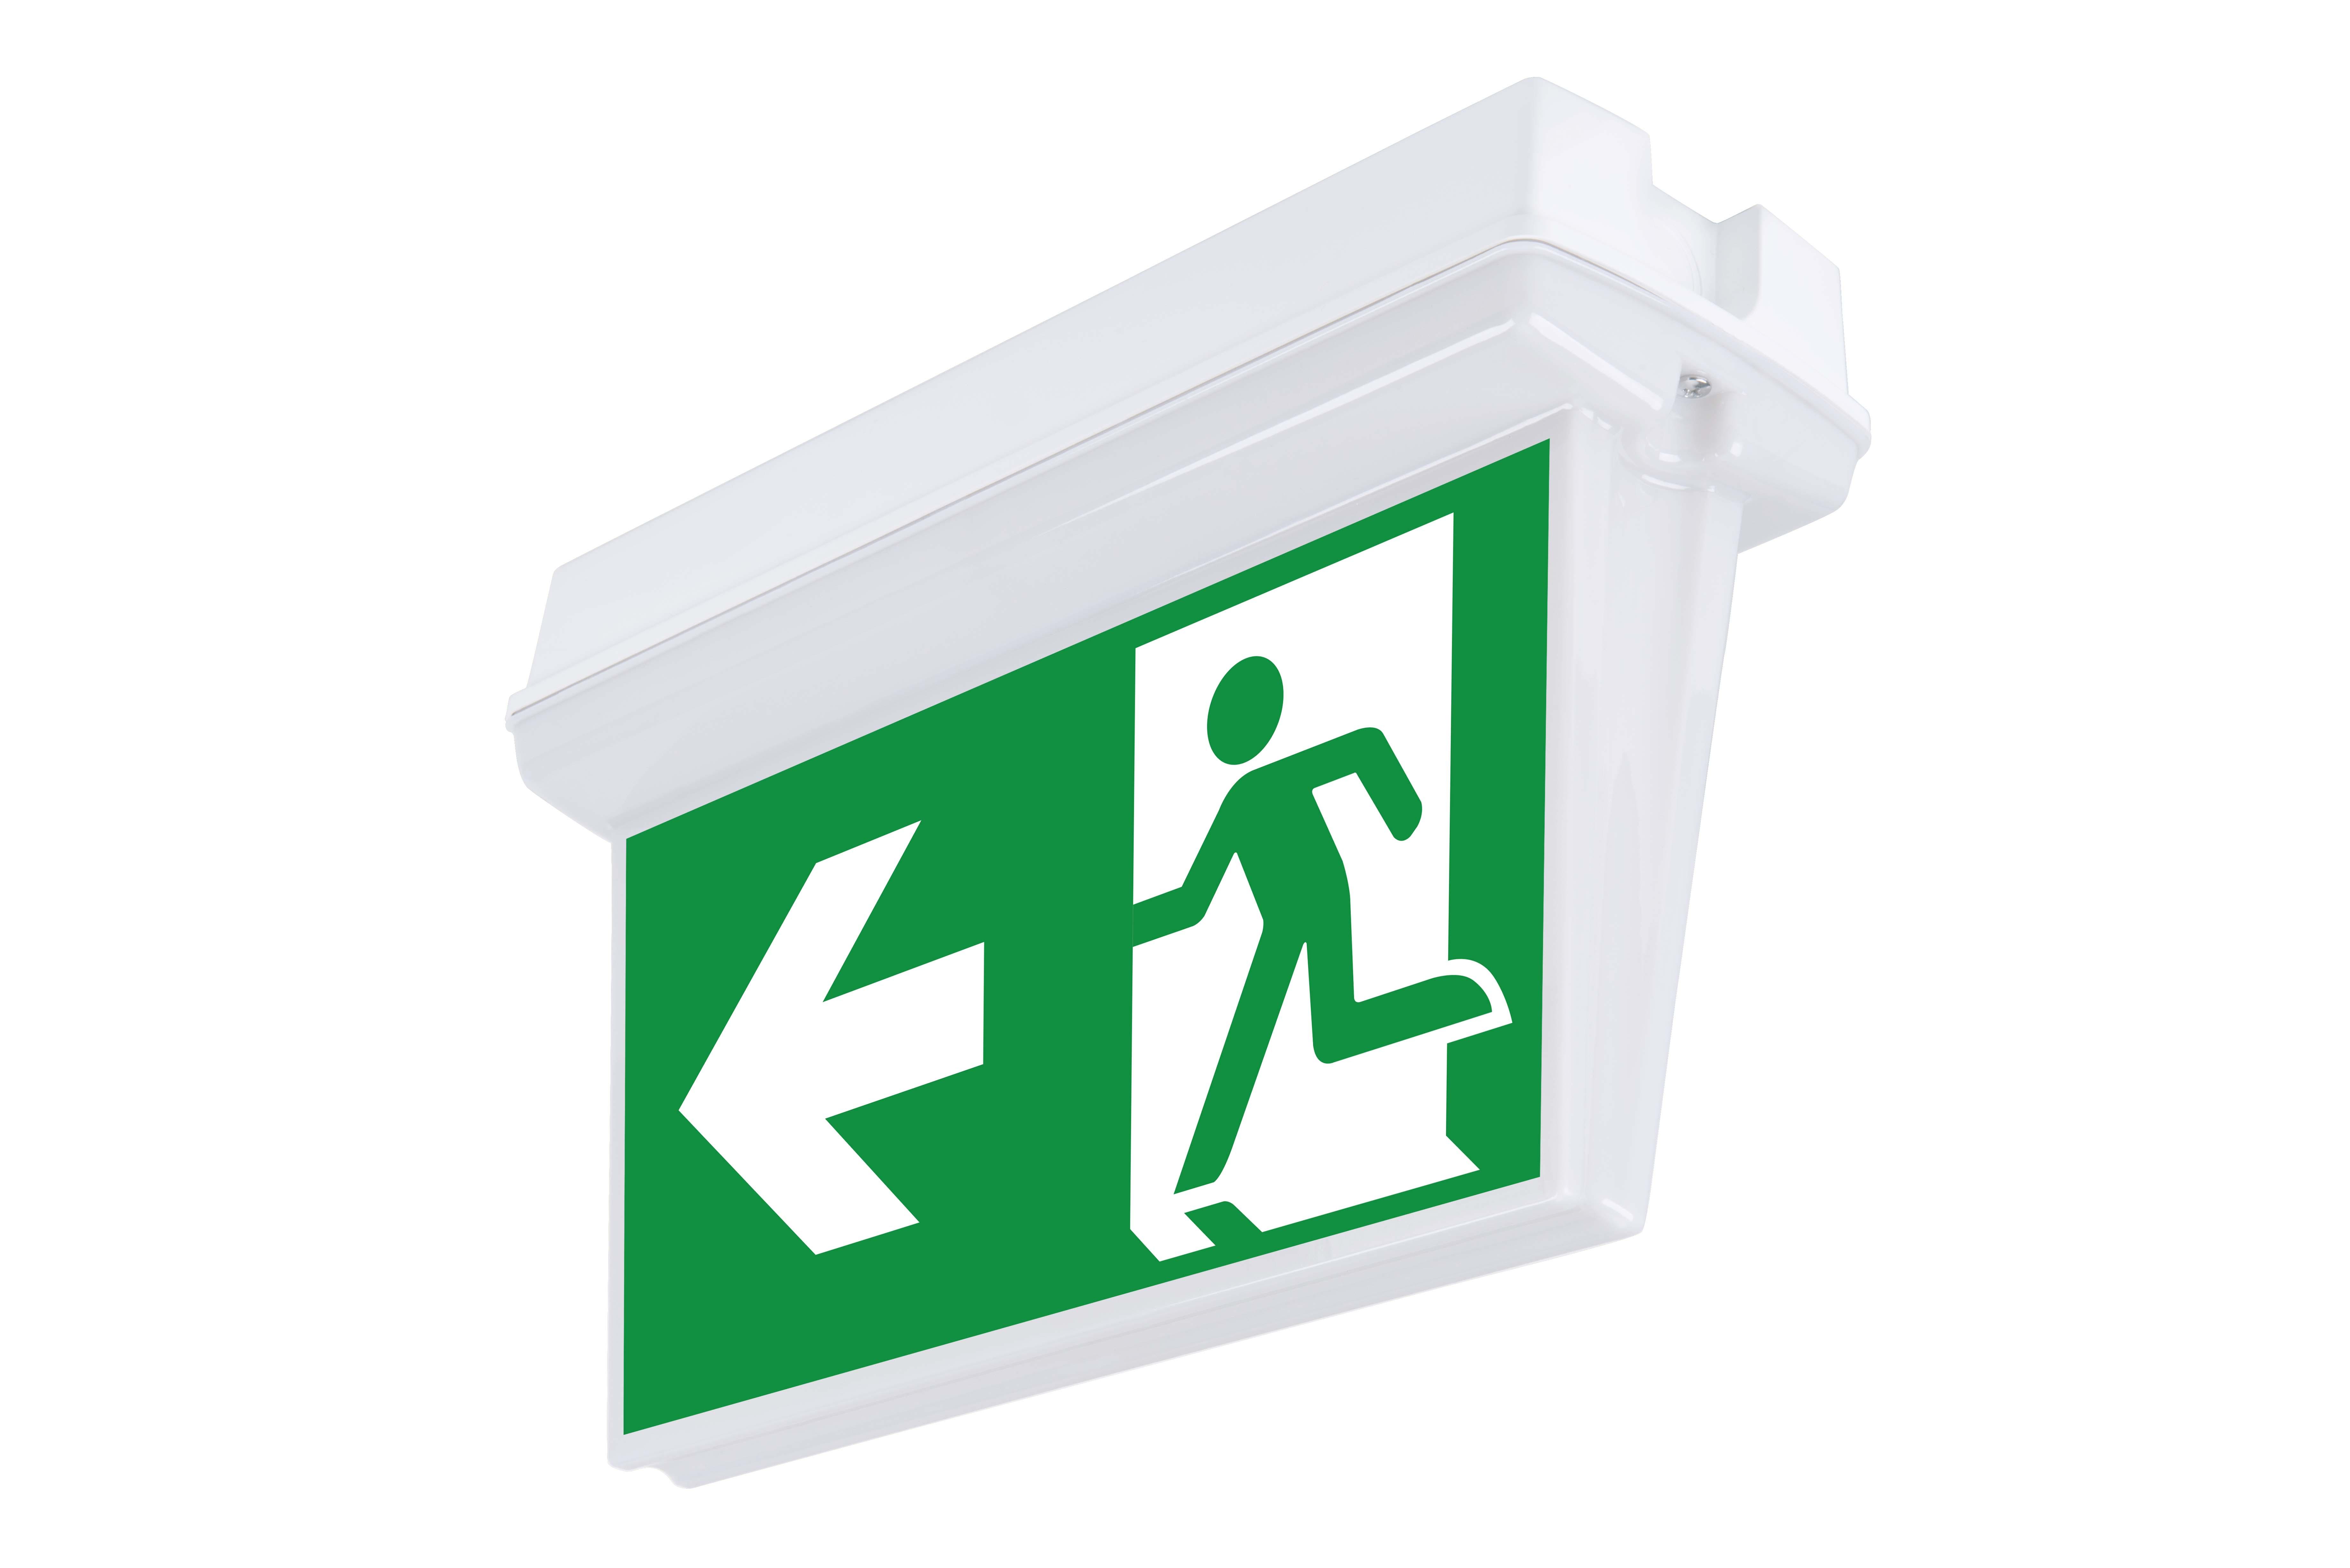 Lampa evacuare led Intelight 98305 3h mentinut/nementinut test manual 154lm 0